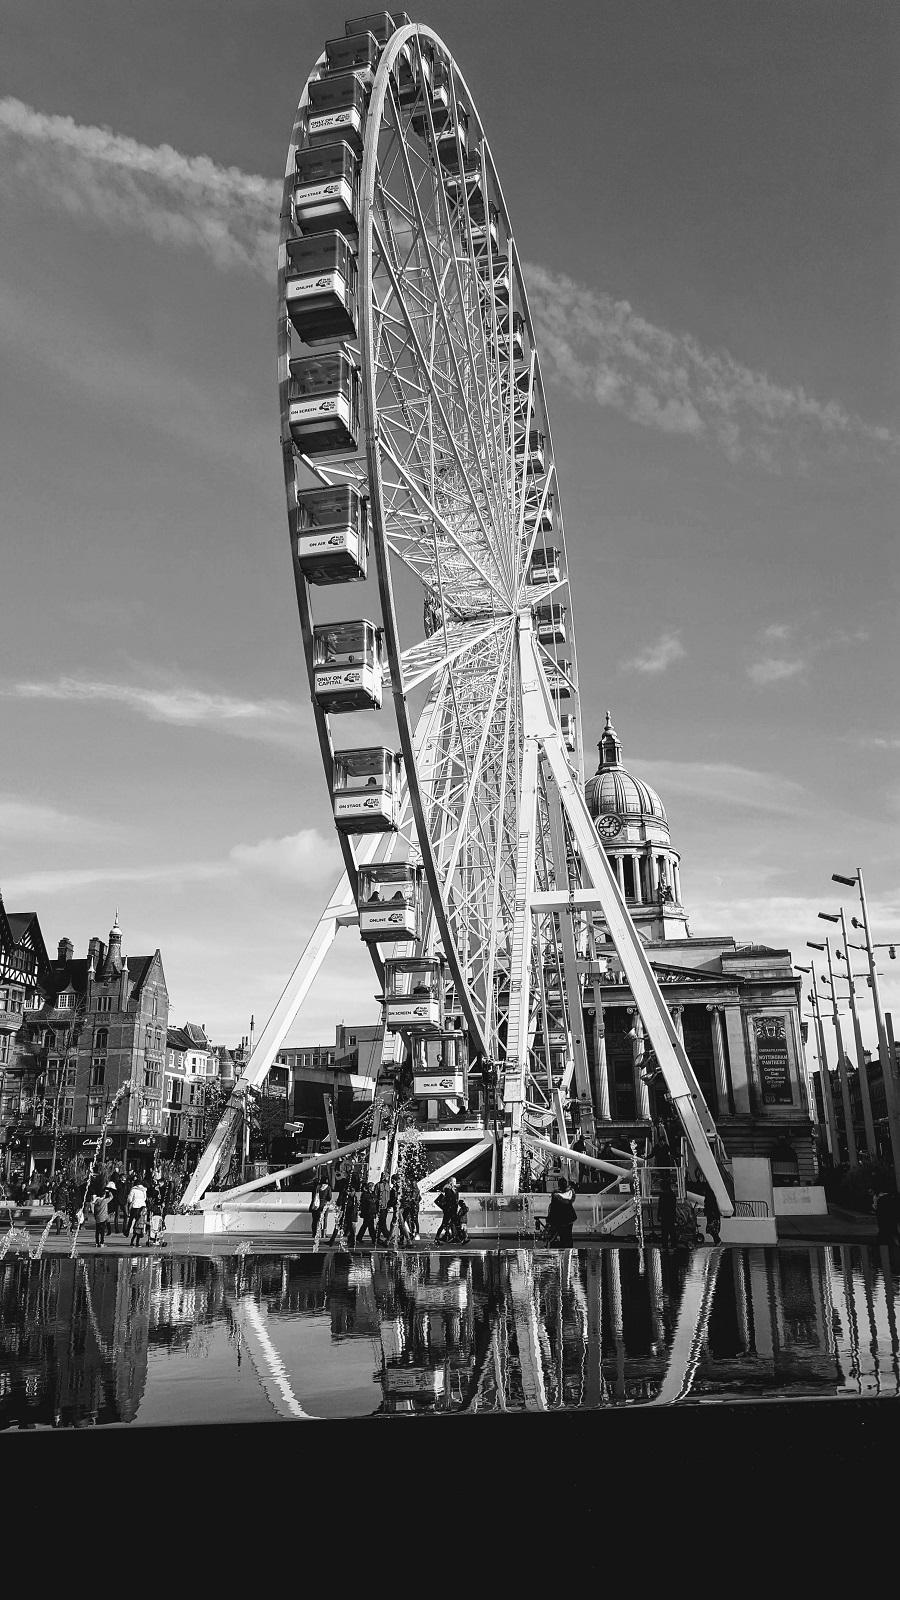 The Big Wheel, Nottingham